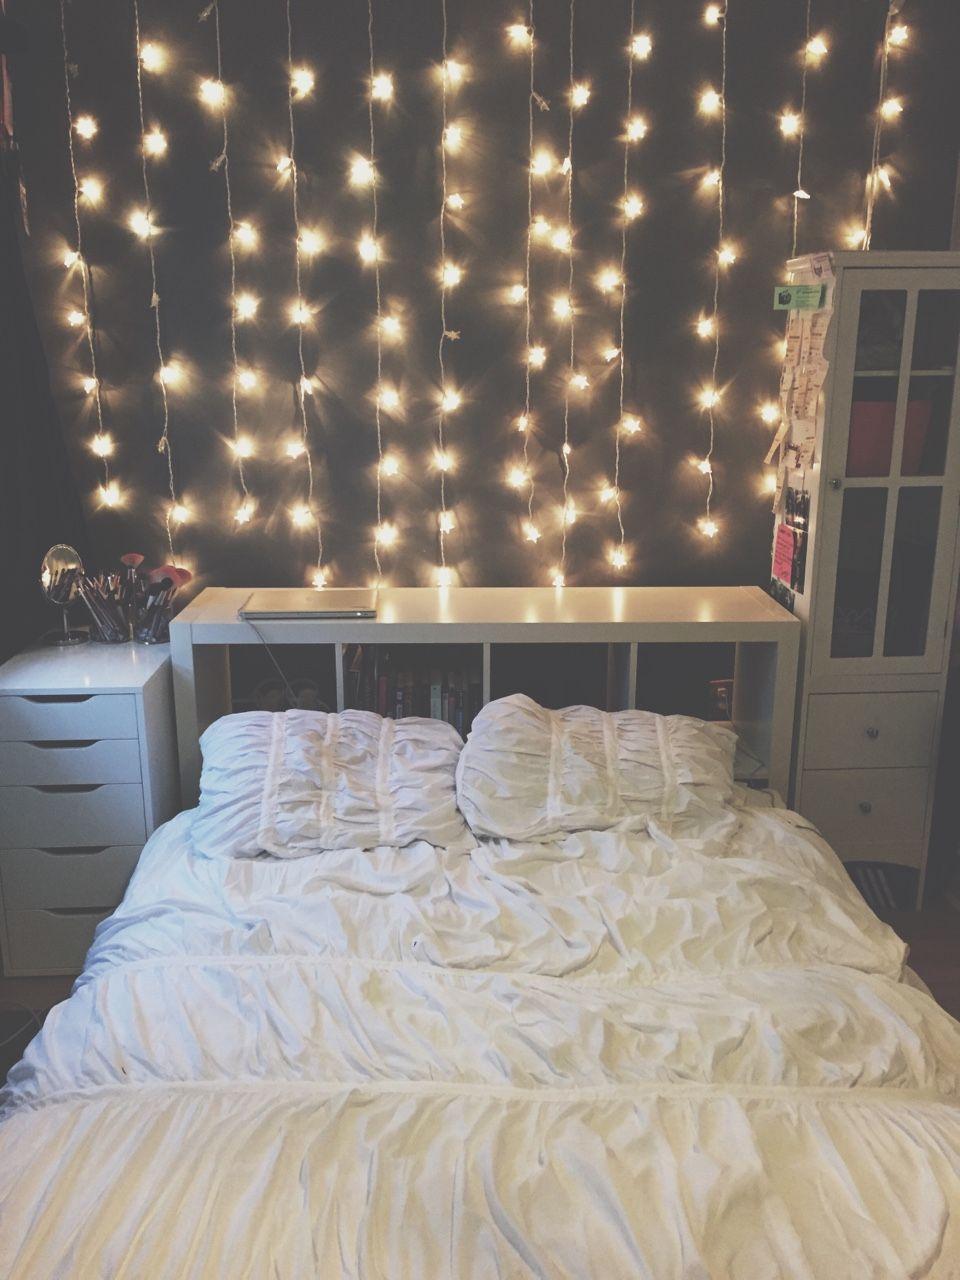 Tumblr Bedrooms Como Decorar Tu Habitacion Decora Tu Habitacion